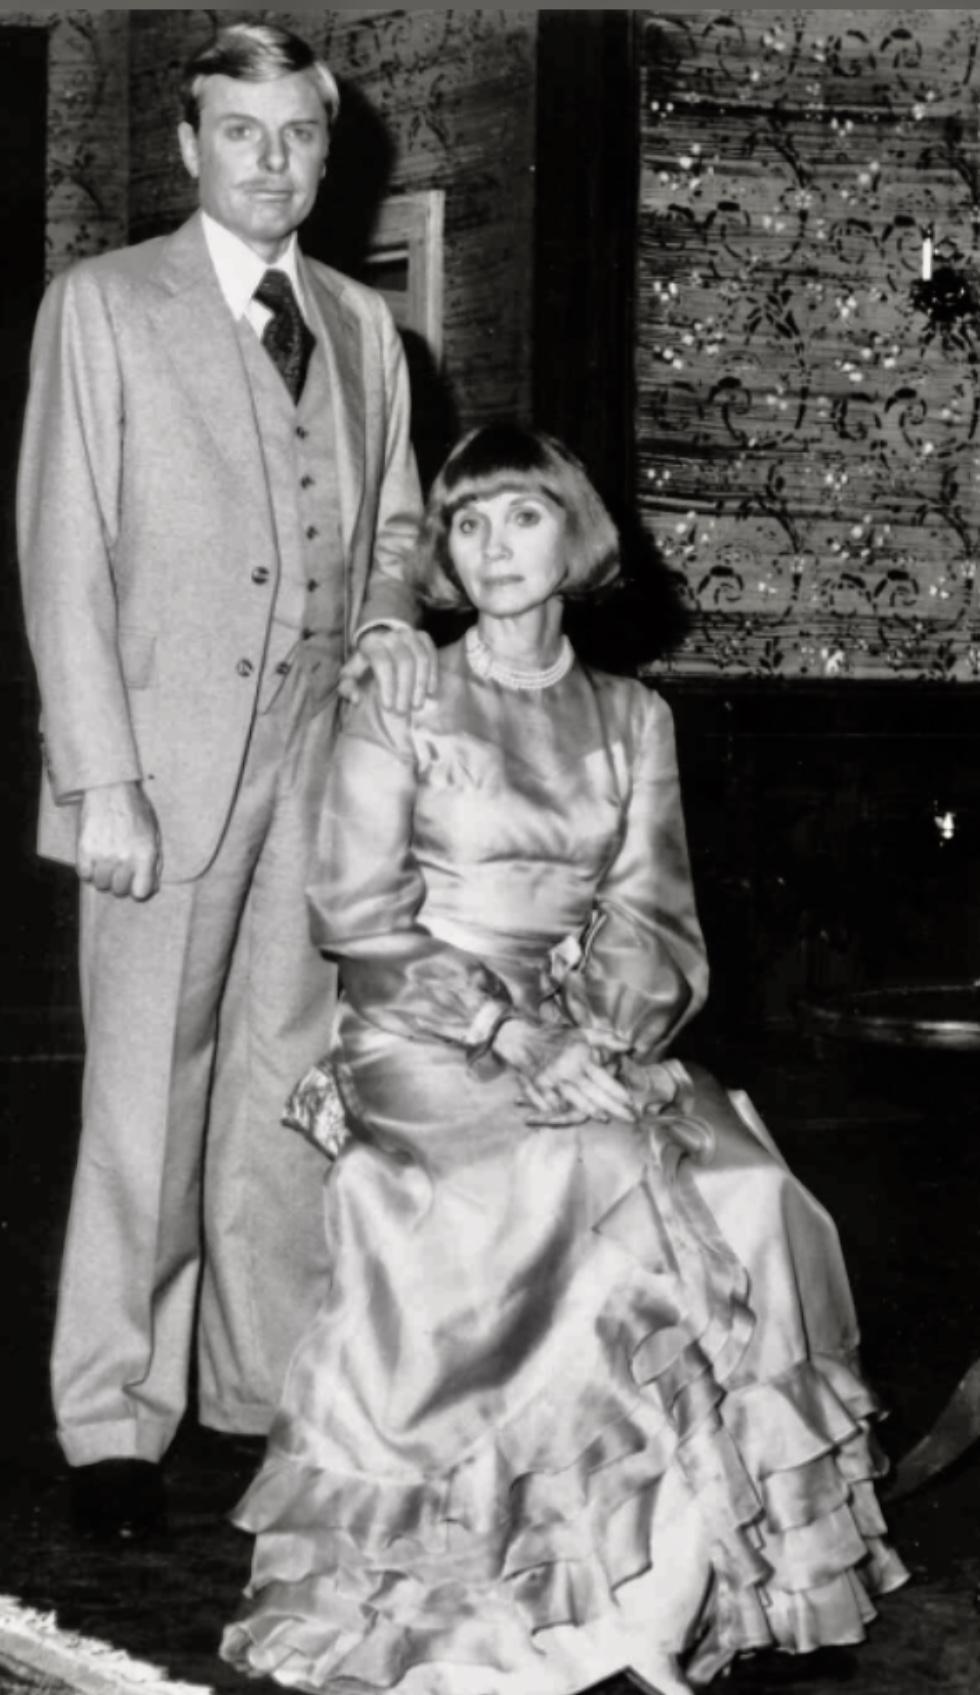 Eva Marie Saint and John McMartin in The Fatal Weakness (1976)